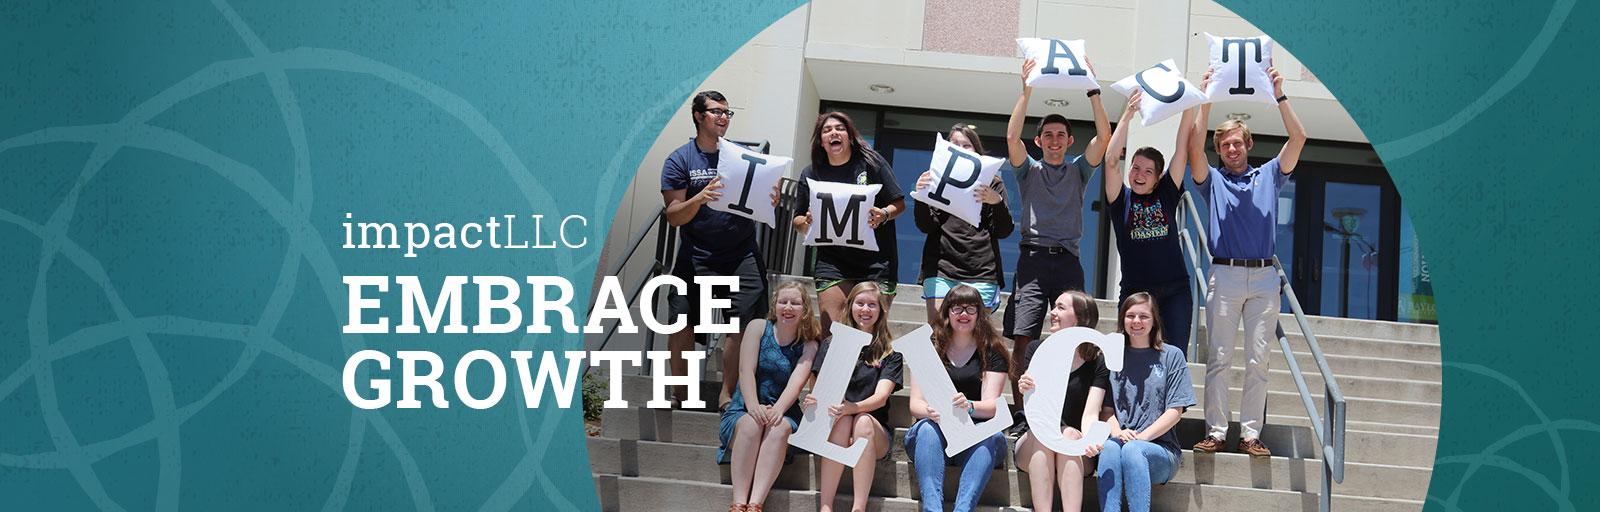 mc_llc-impact-embrace-growth